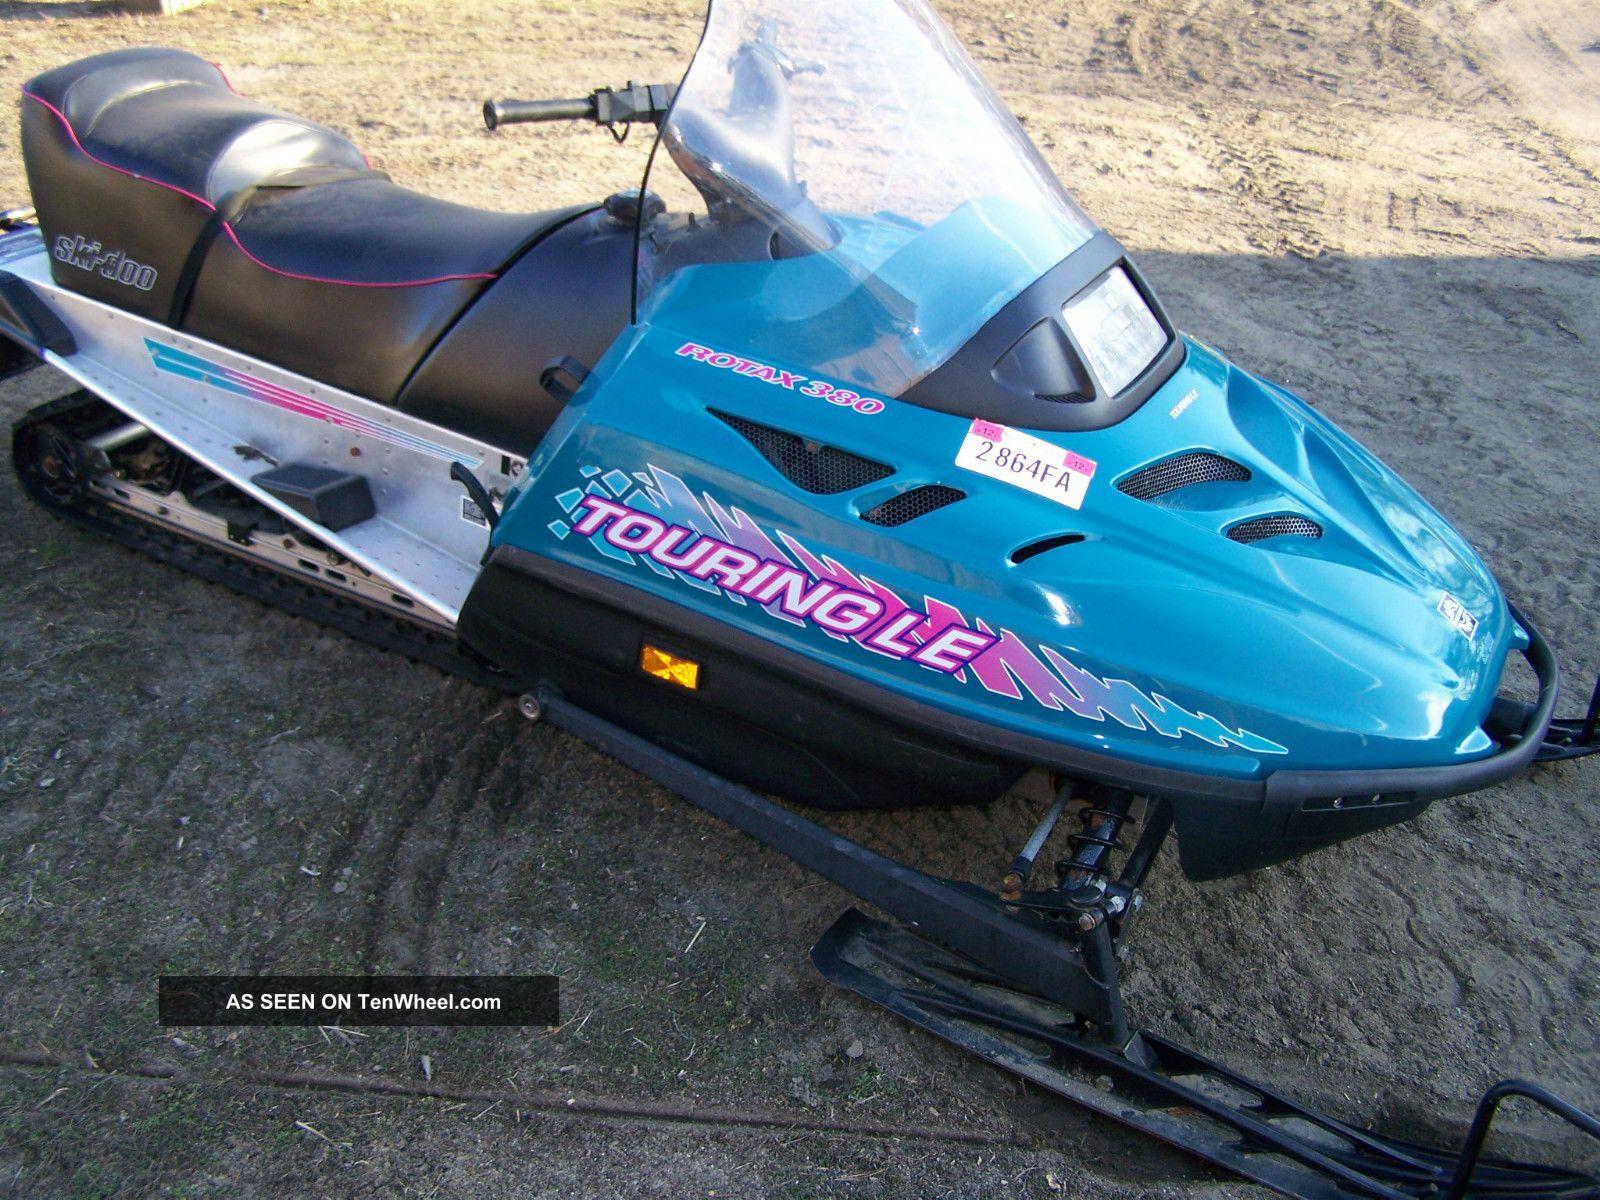 1995 ski doo touring e rh tenwheel com 1996 Ski-Doo Touring E Parts Catalog  1996 Ski-Doo Grand Touring